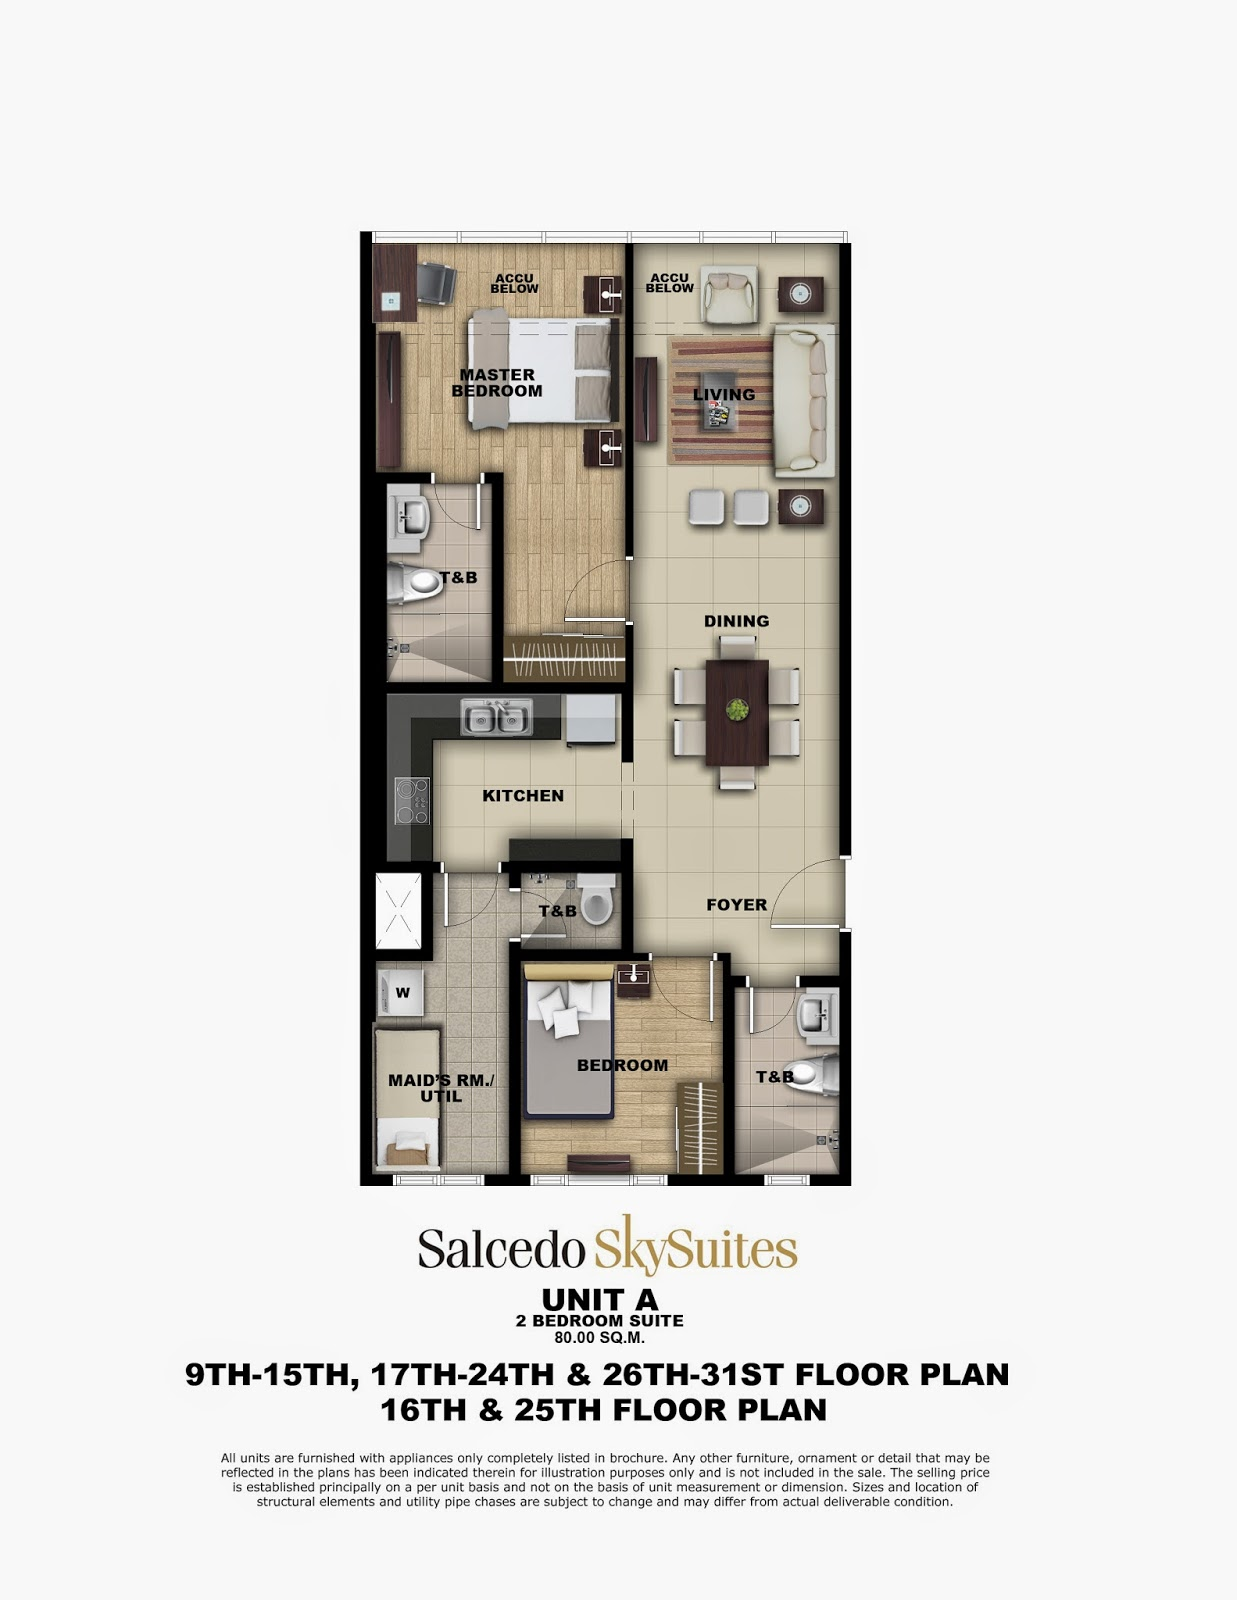 towers 2 bedroom suite